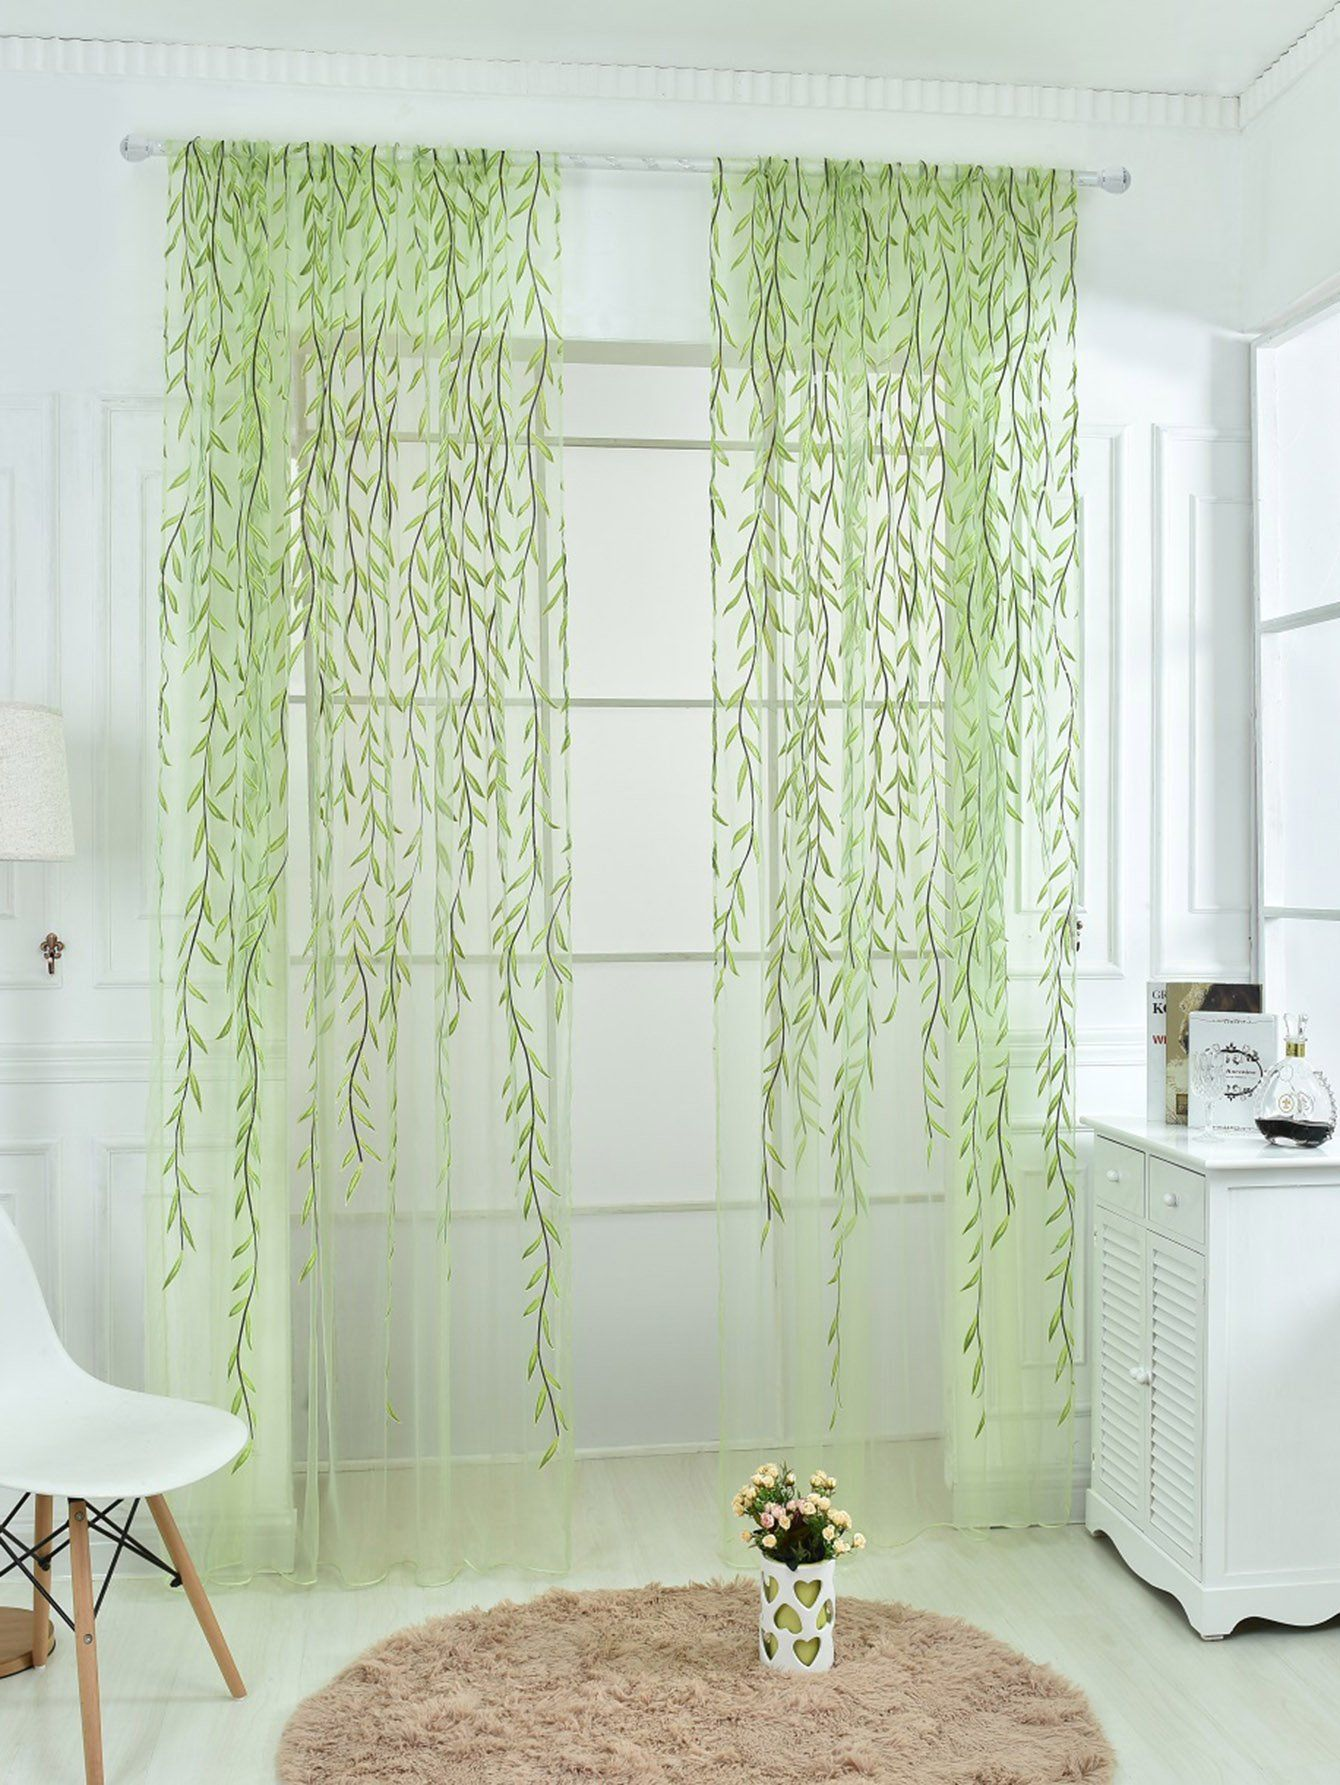 drape drapes for mesh north pipe shop decor wedding and denton shar shear party rentals